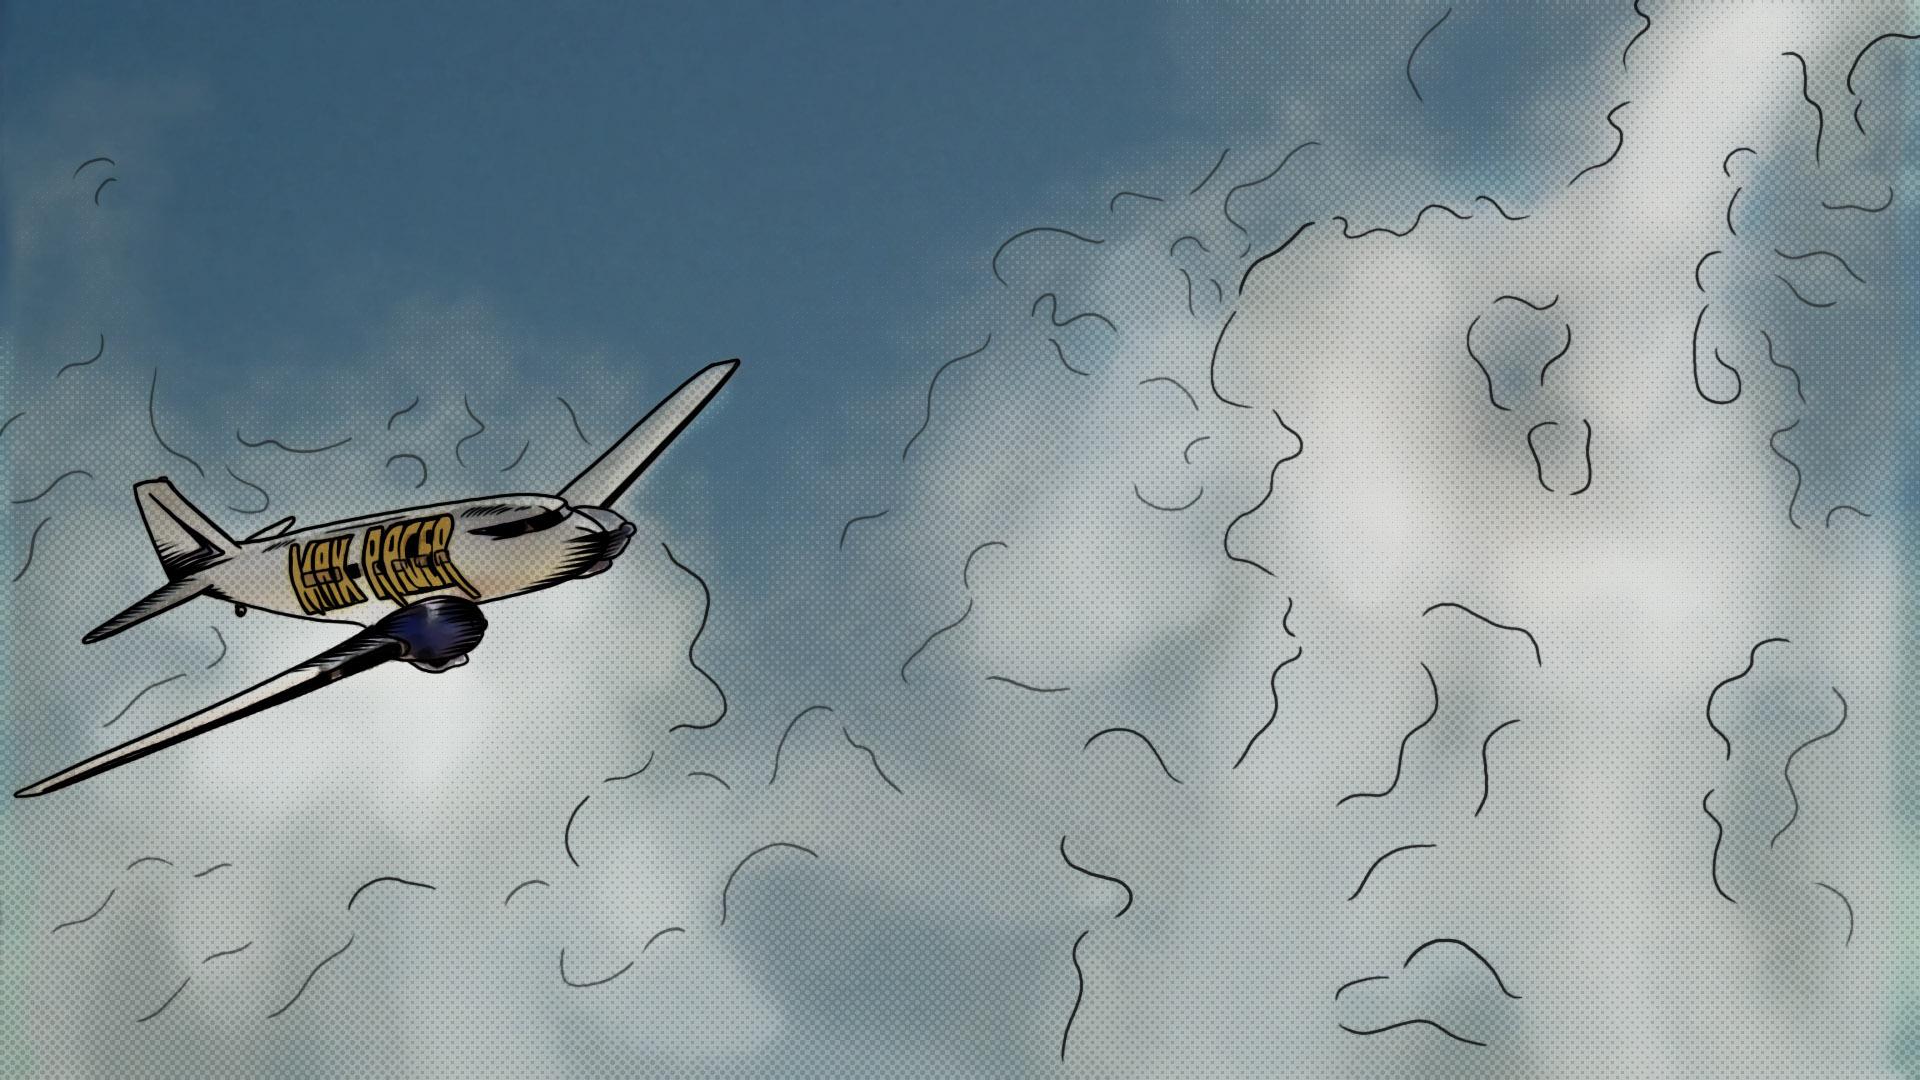 Ep5_001_Plane_RD_VFX